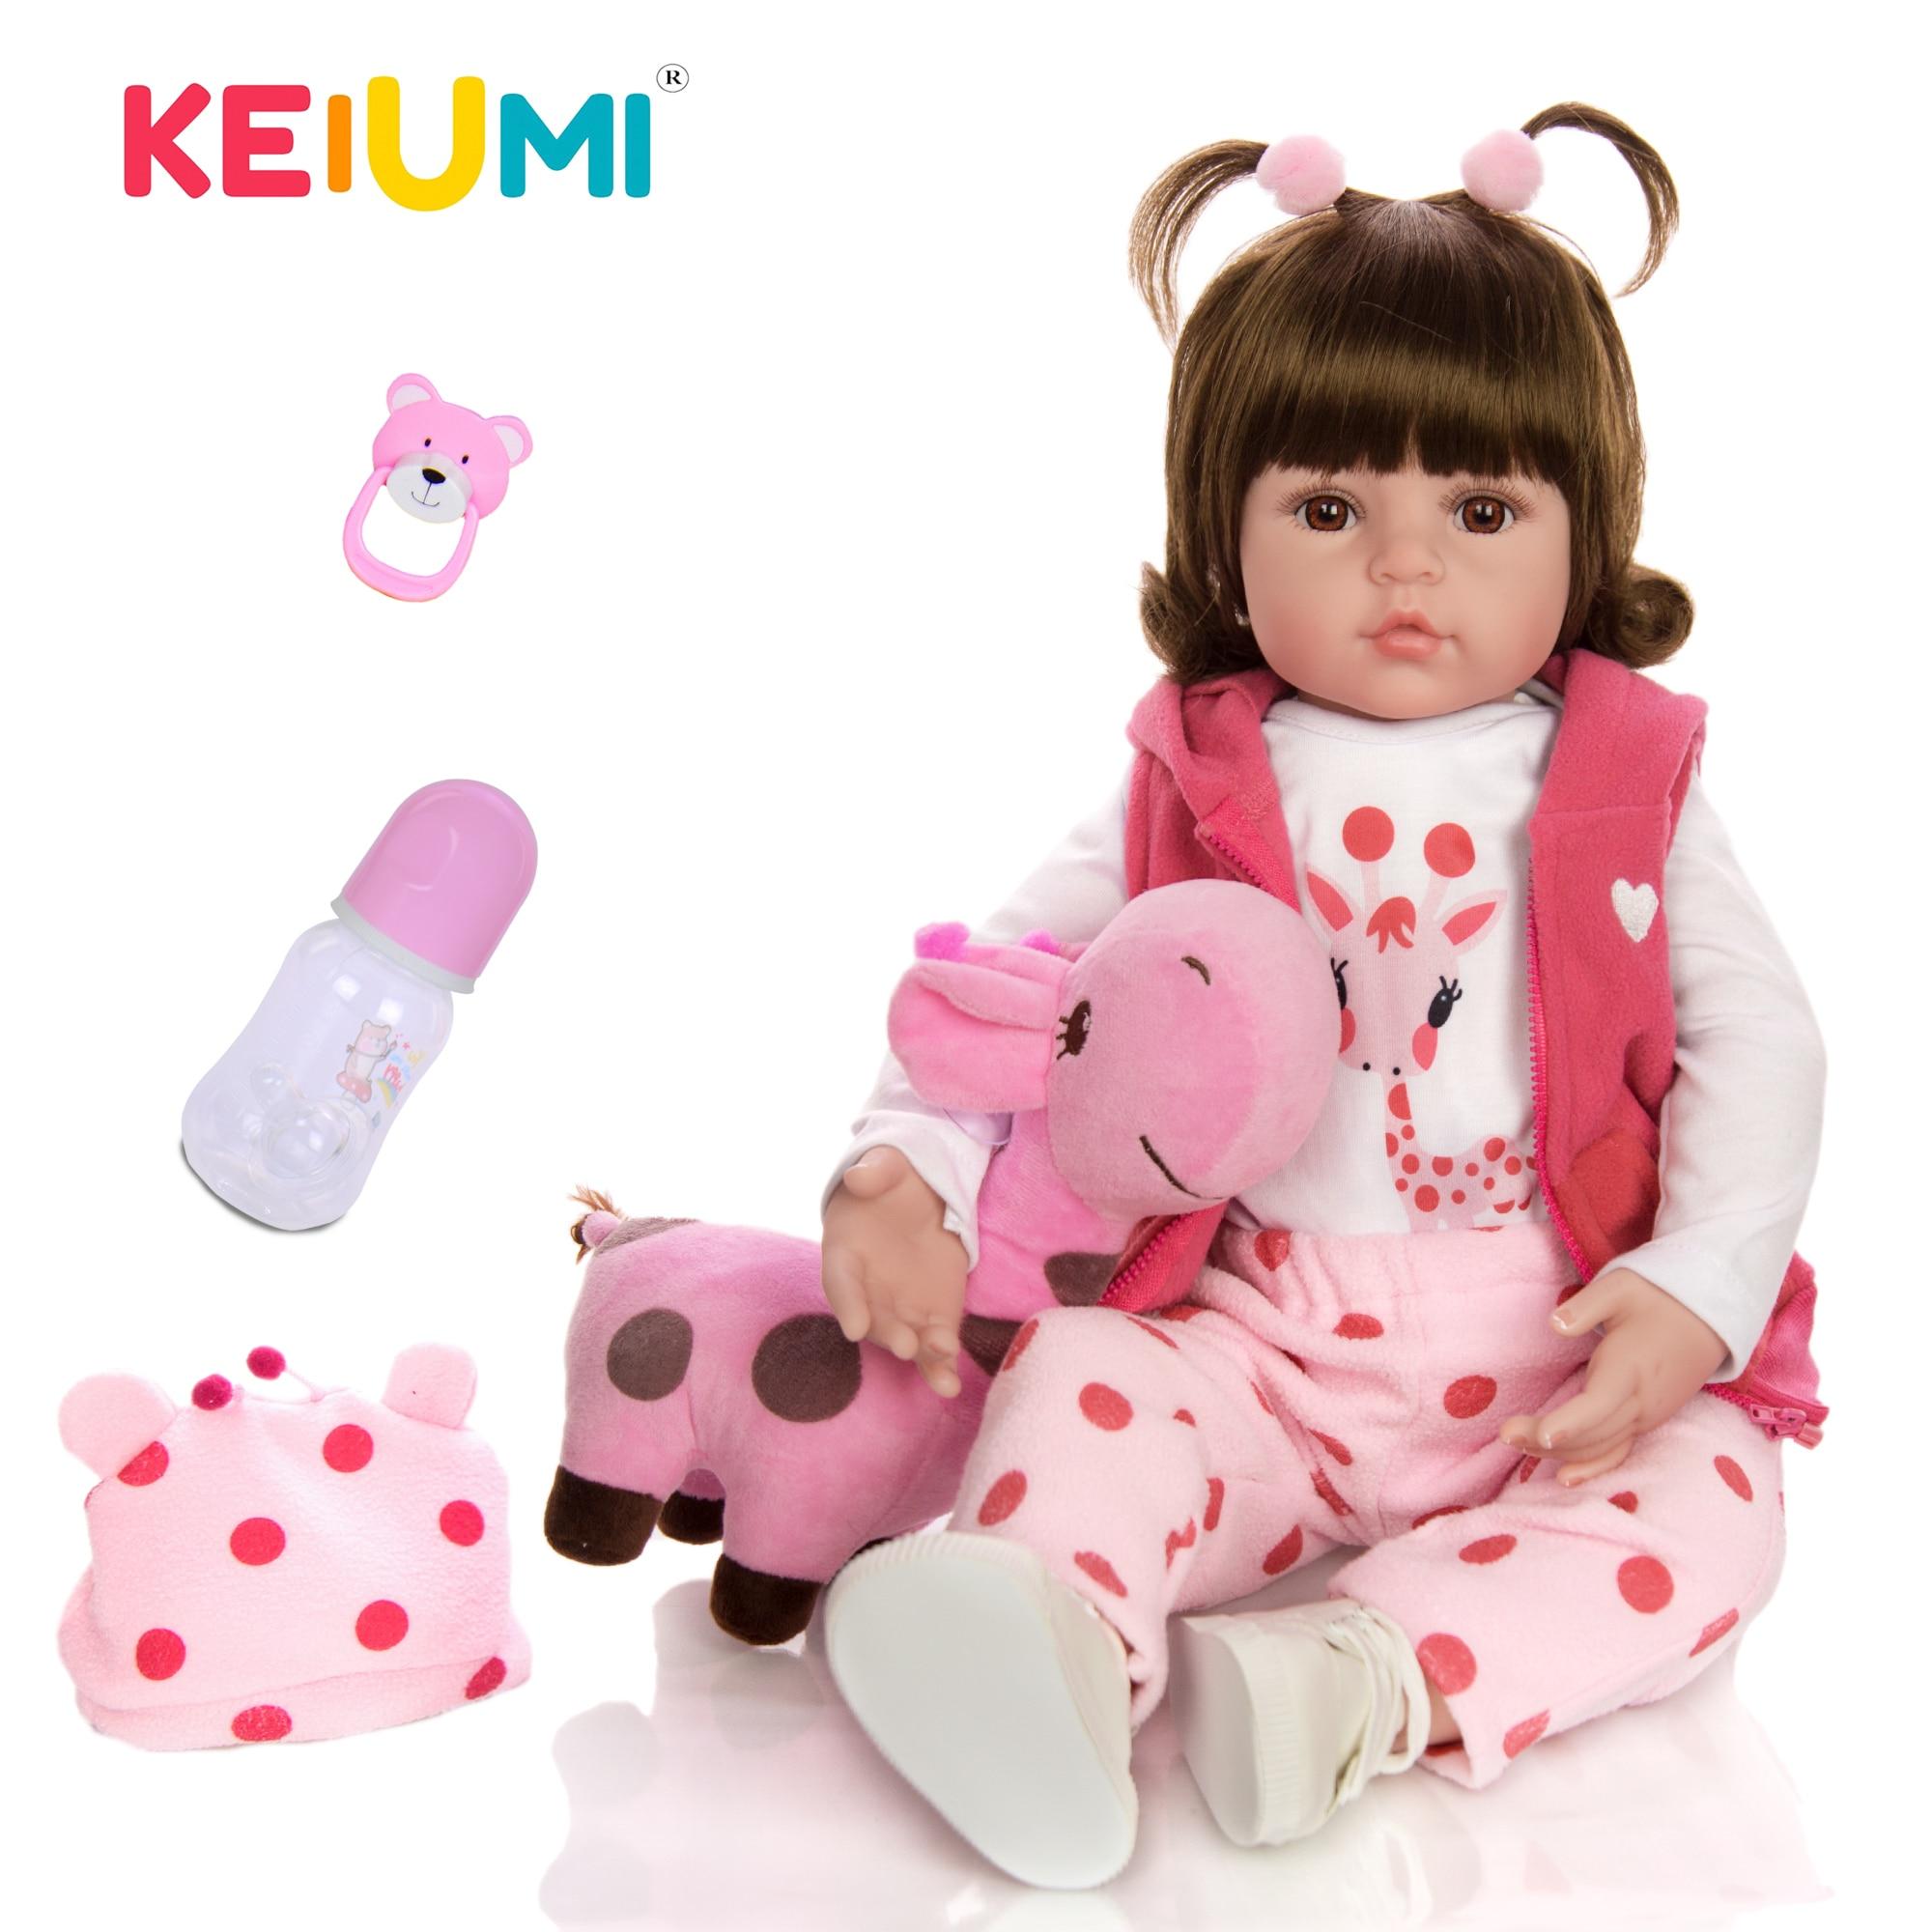 Bebe reborn realiste fille Keiumi 0005